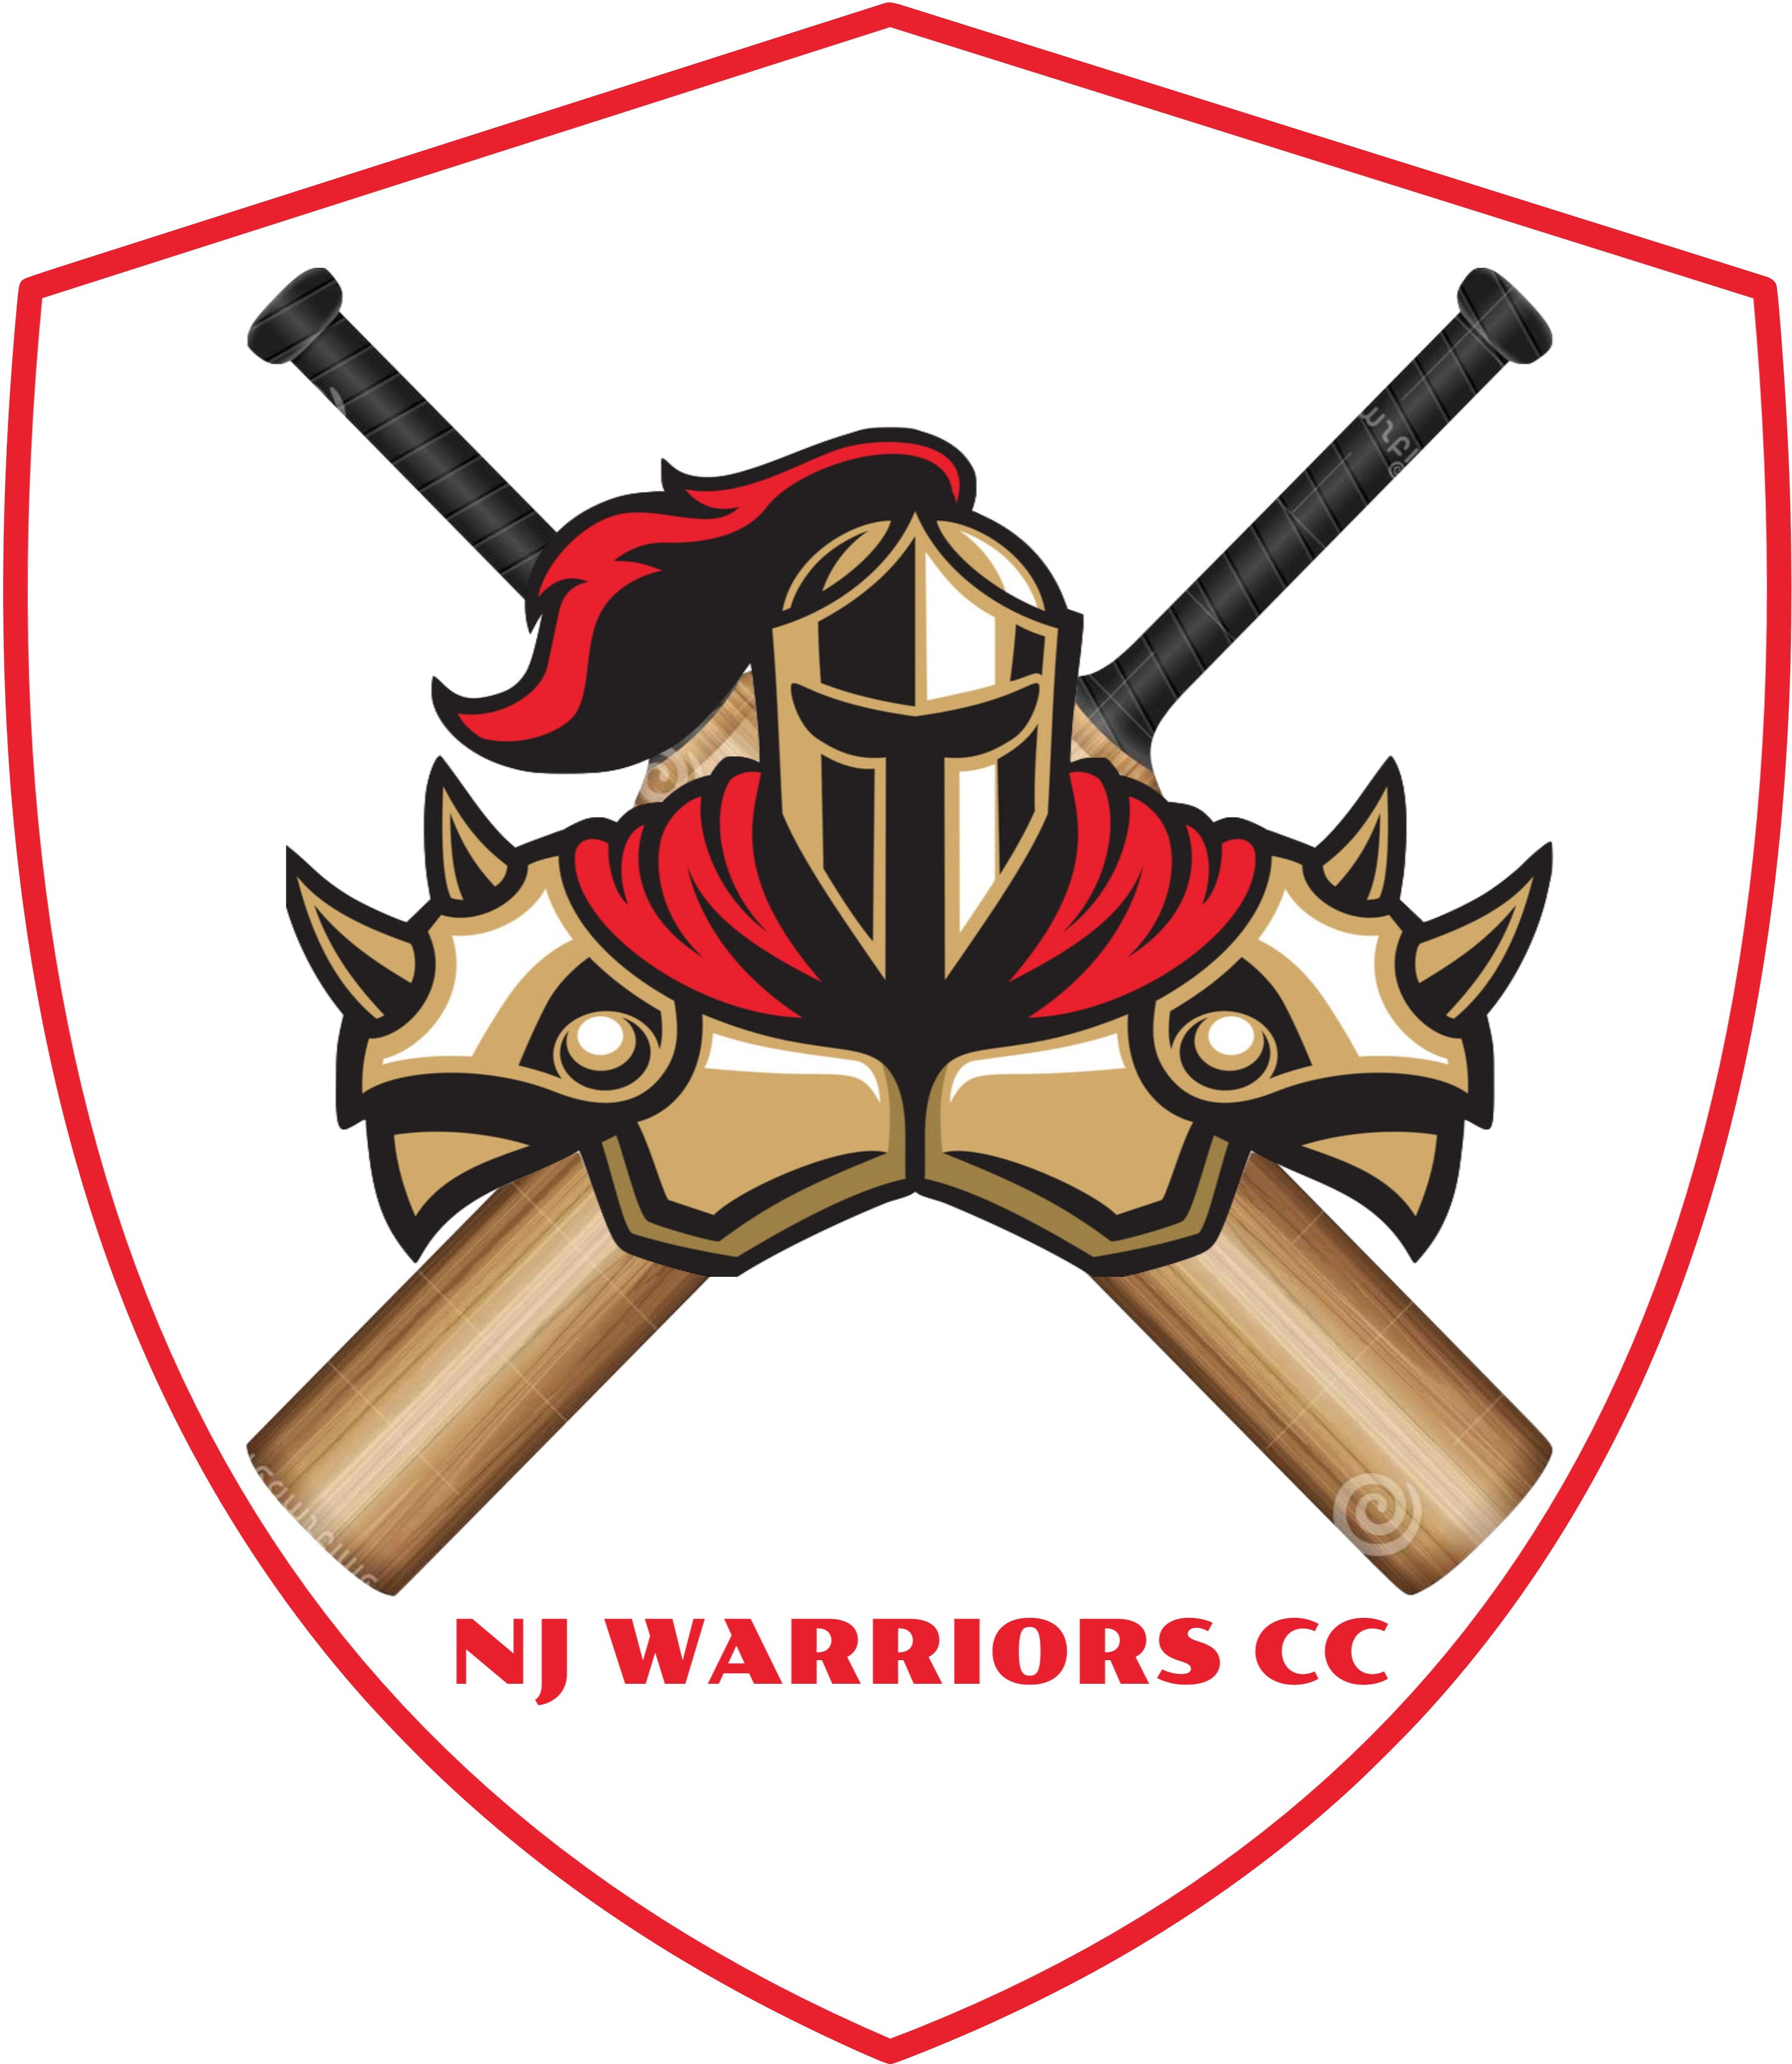 NJ WARRIORS CRICKET CLUB